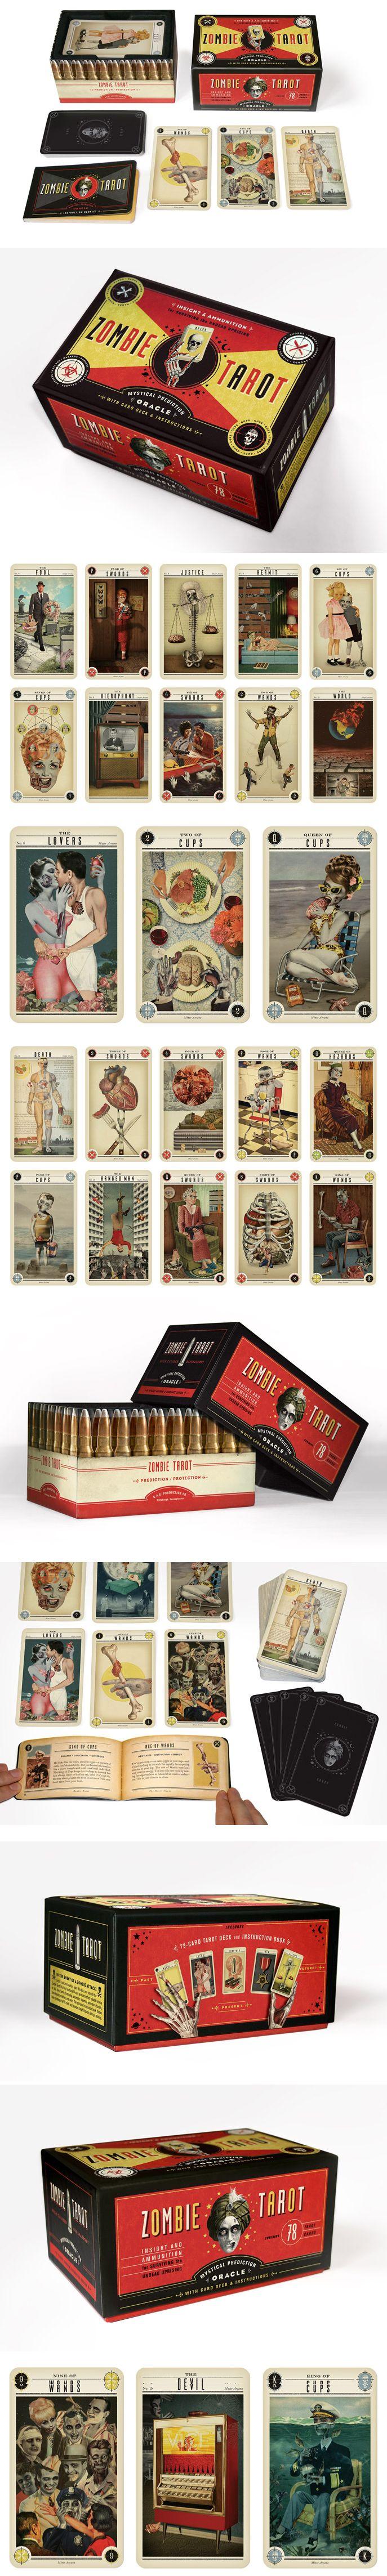 Zombie Tarot Cards | Designed By: Headcase Design - http://www.headcasedesign.com/     Designers / Illustrators: Paul Kepple, Ralph Geroni